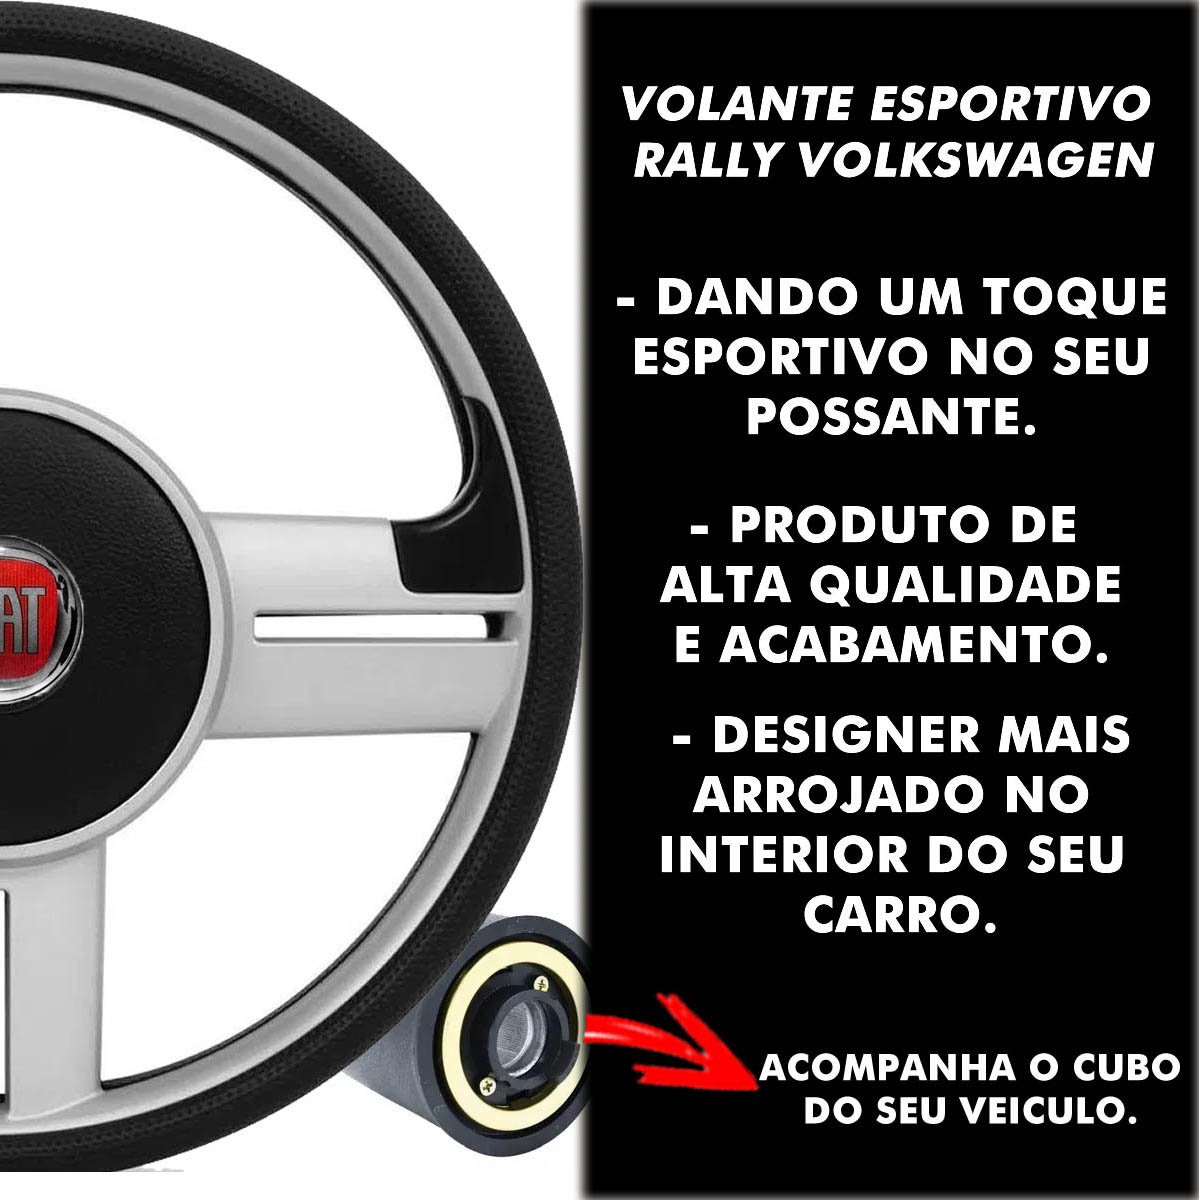 Volante Fiat Surf Rallye Esportivo Cubo Palio Uno 1983 a 2013 Strada Siena Punto Idea Stilo